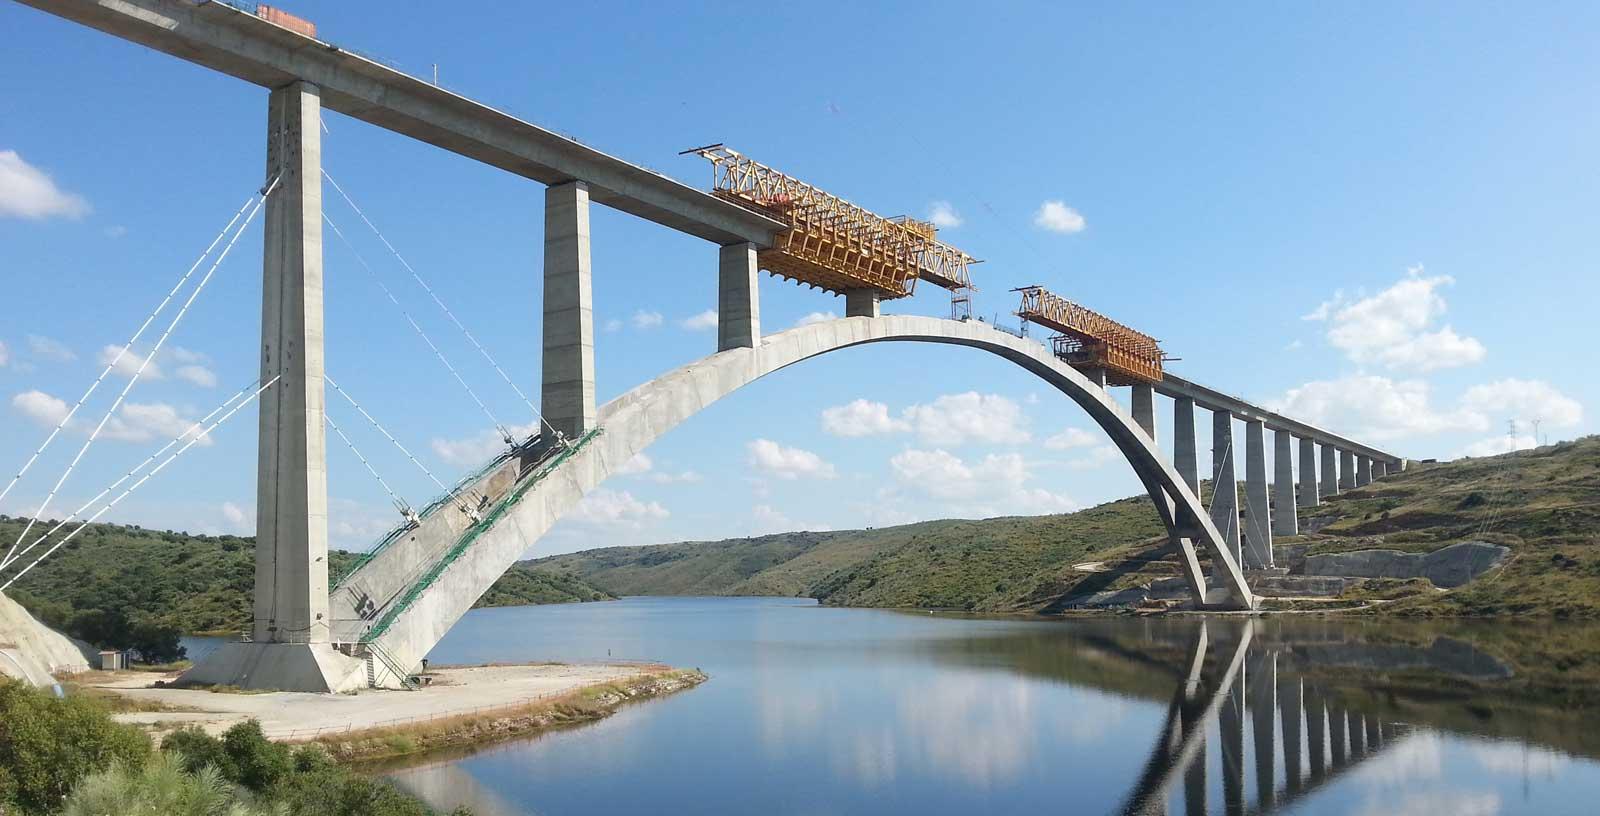 Alta_velocidad_Madrid_Extremadura_transporte_ferrocarril_idom_1